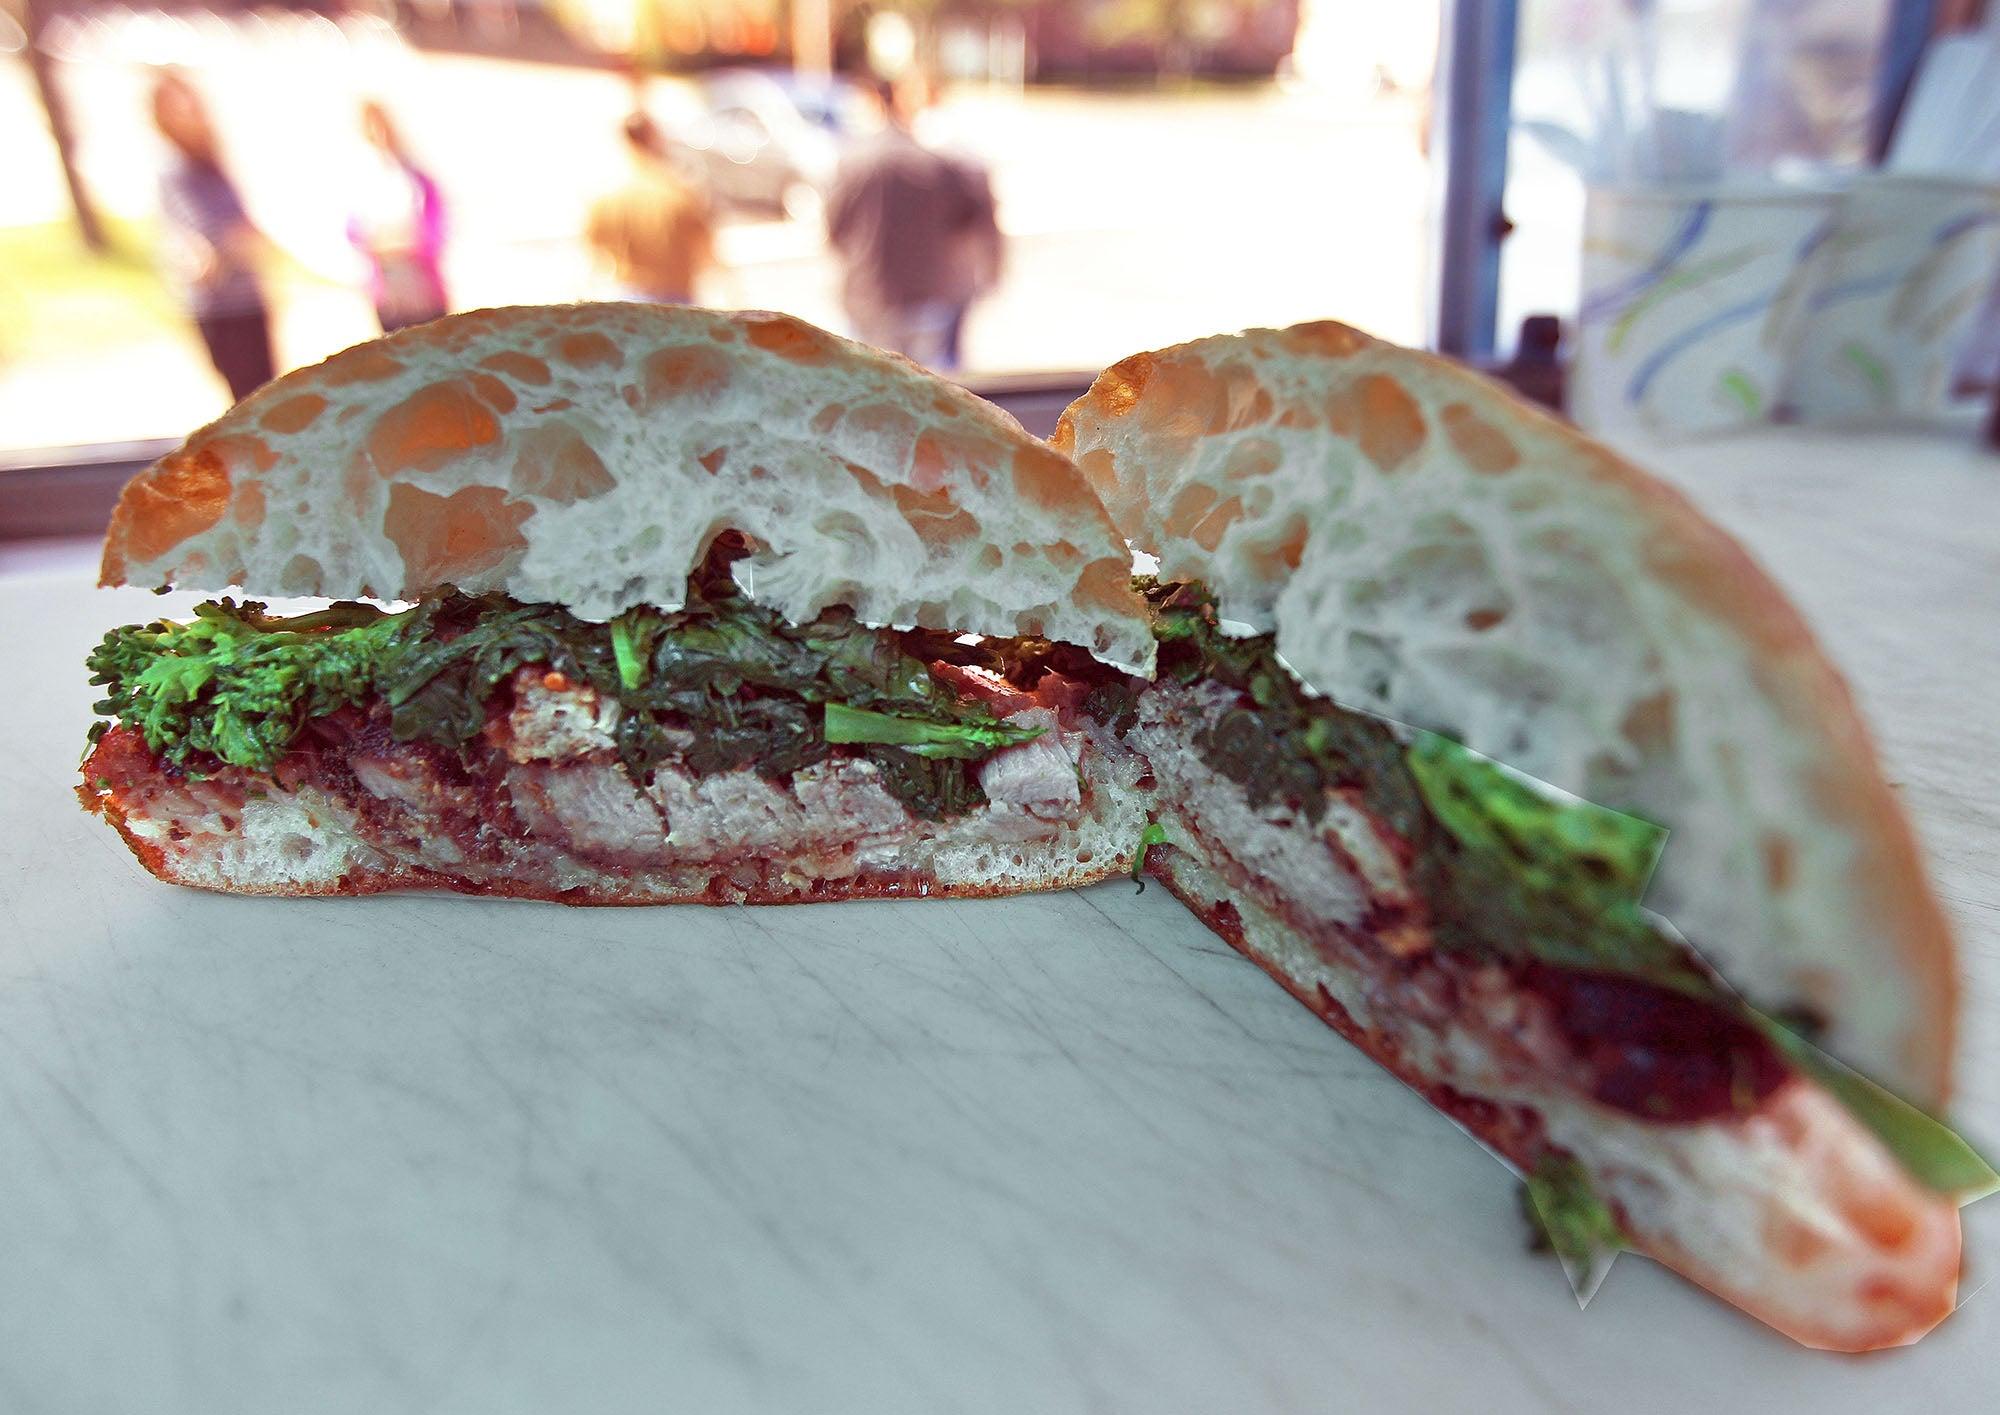 The Porchetta sandwich from Pennypacker's